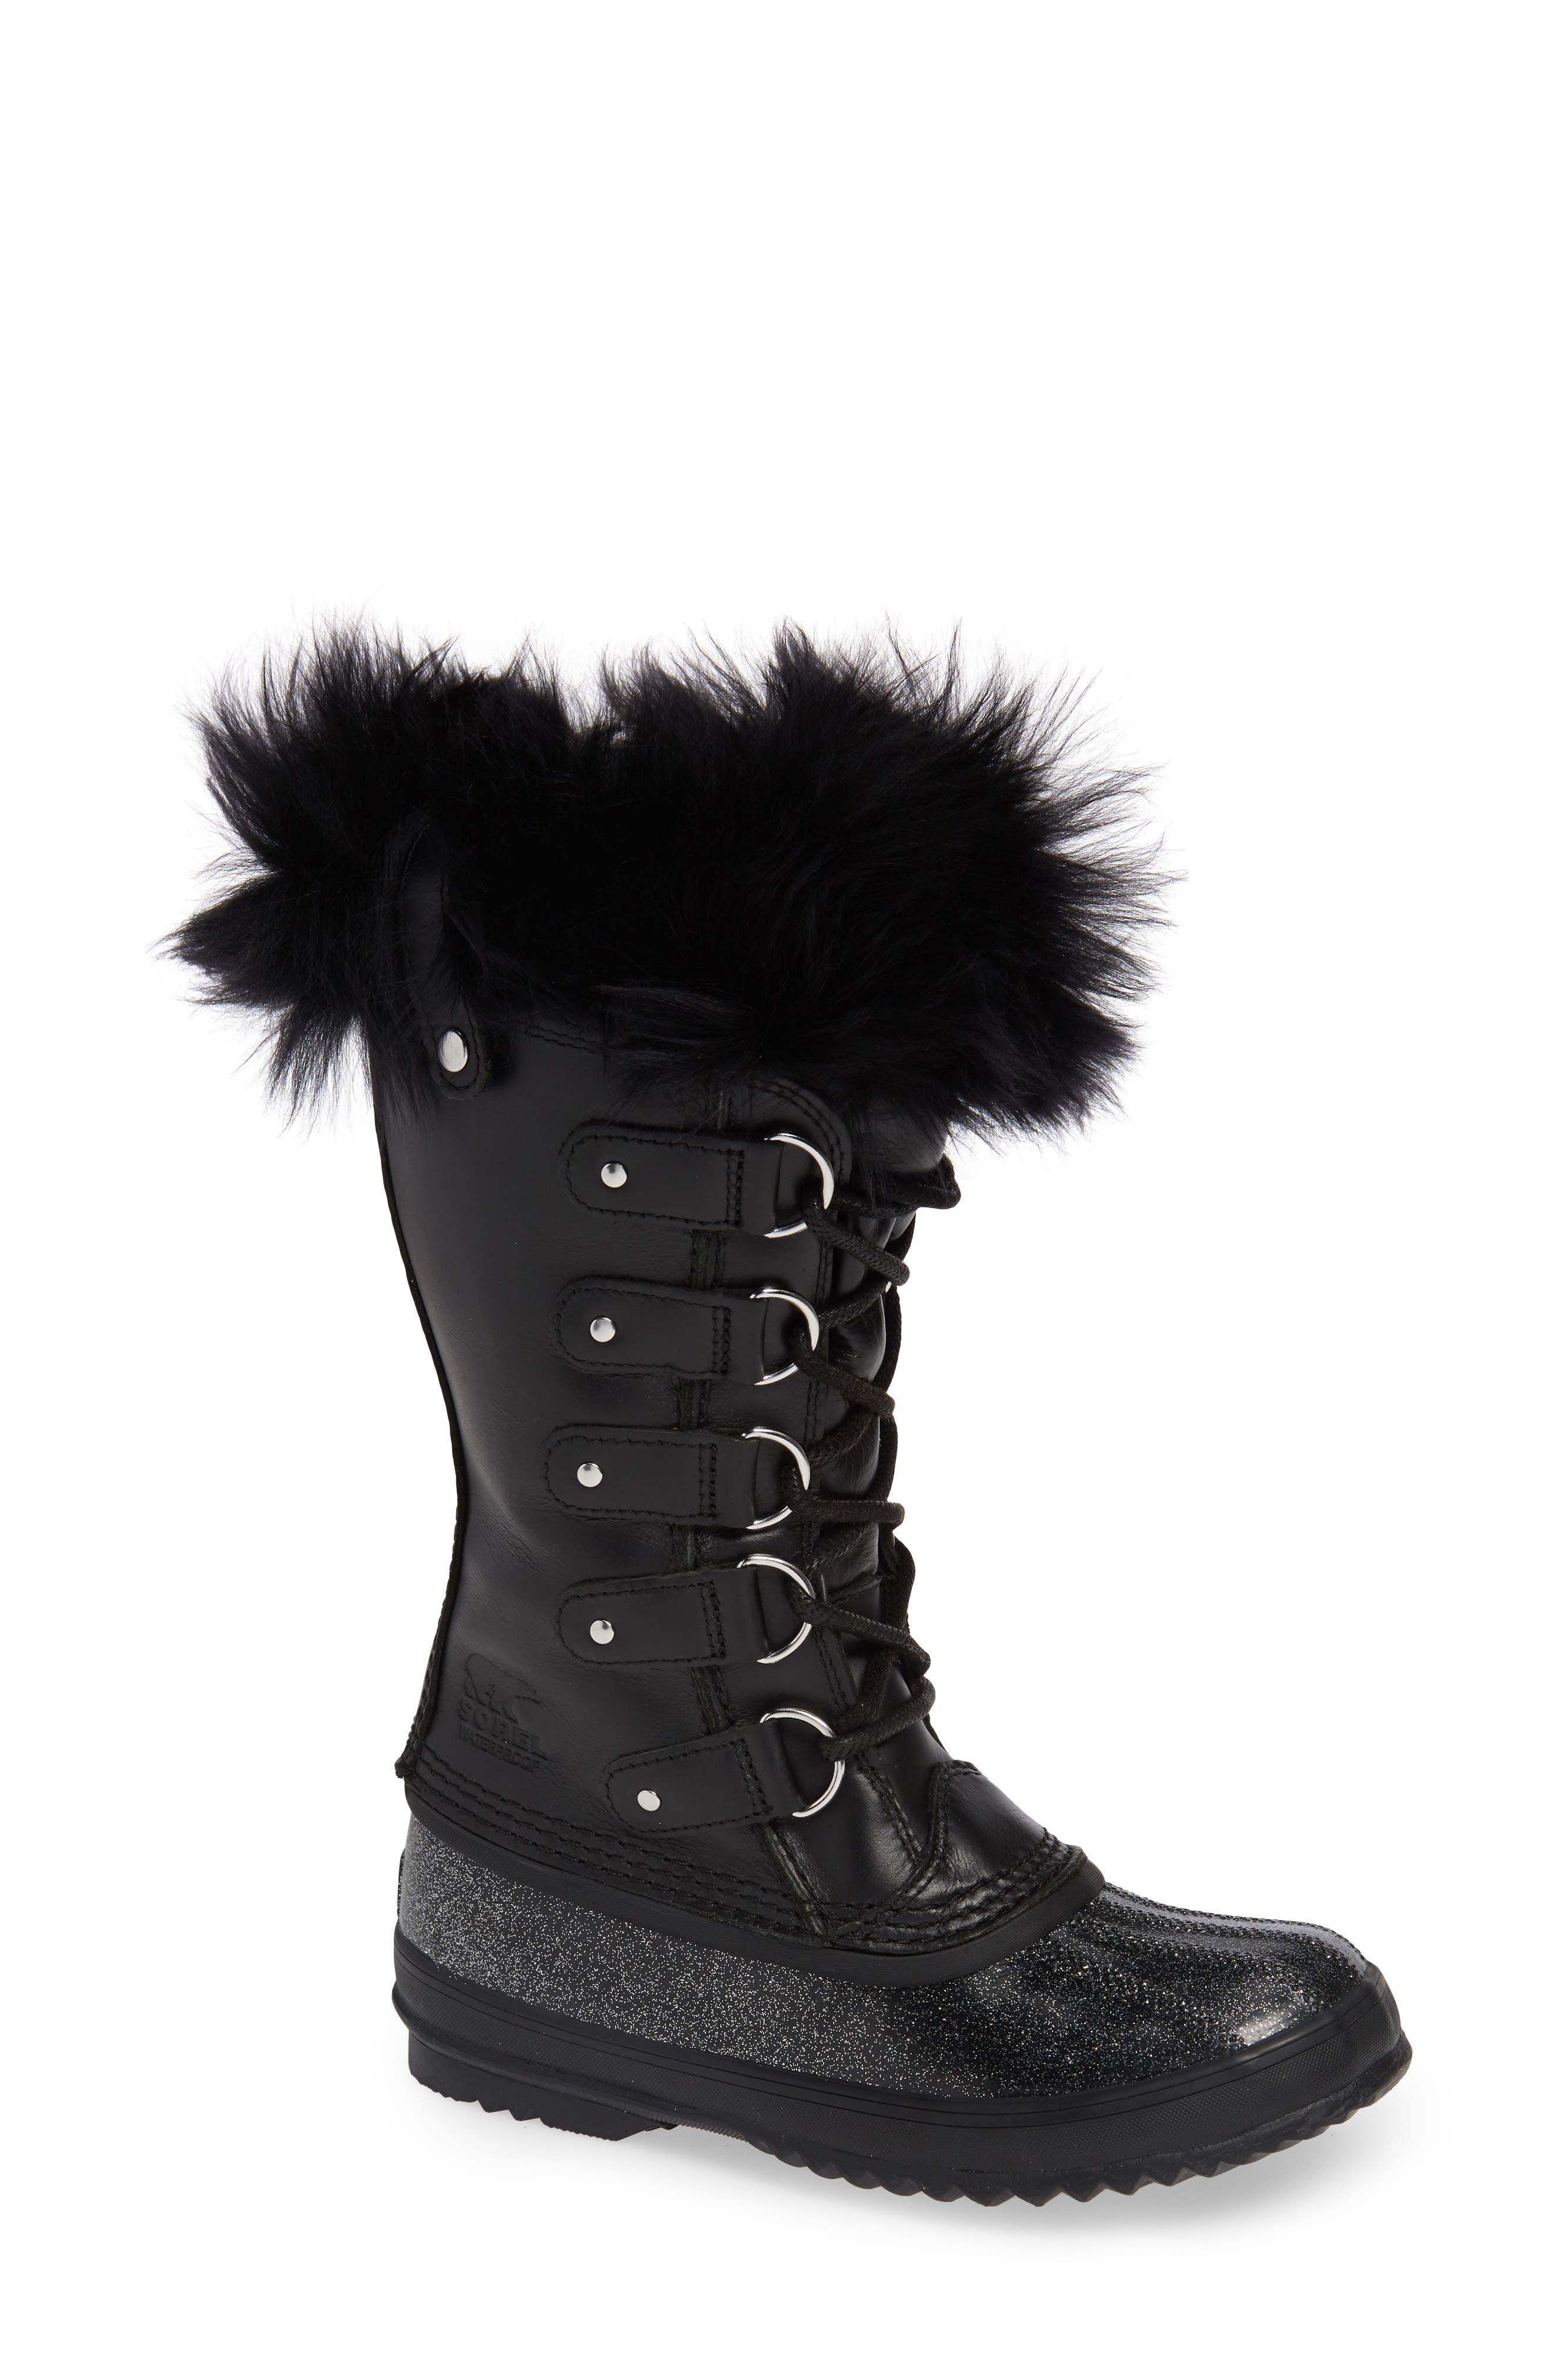 Sorel Joan Of Arctic(TM) Lux Waterproof Winter Boot With Genuine Shearling